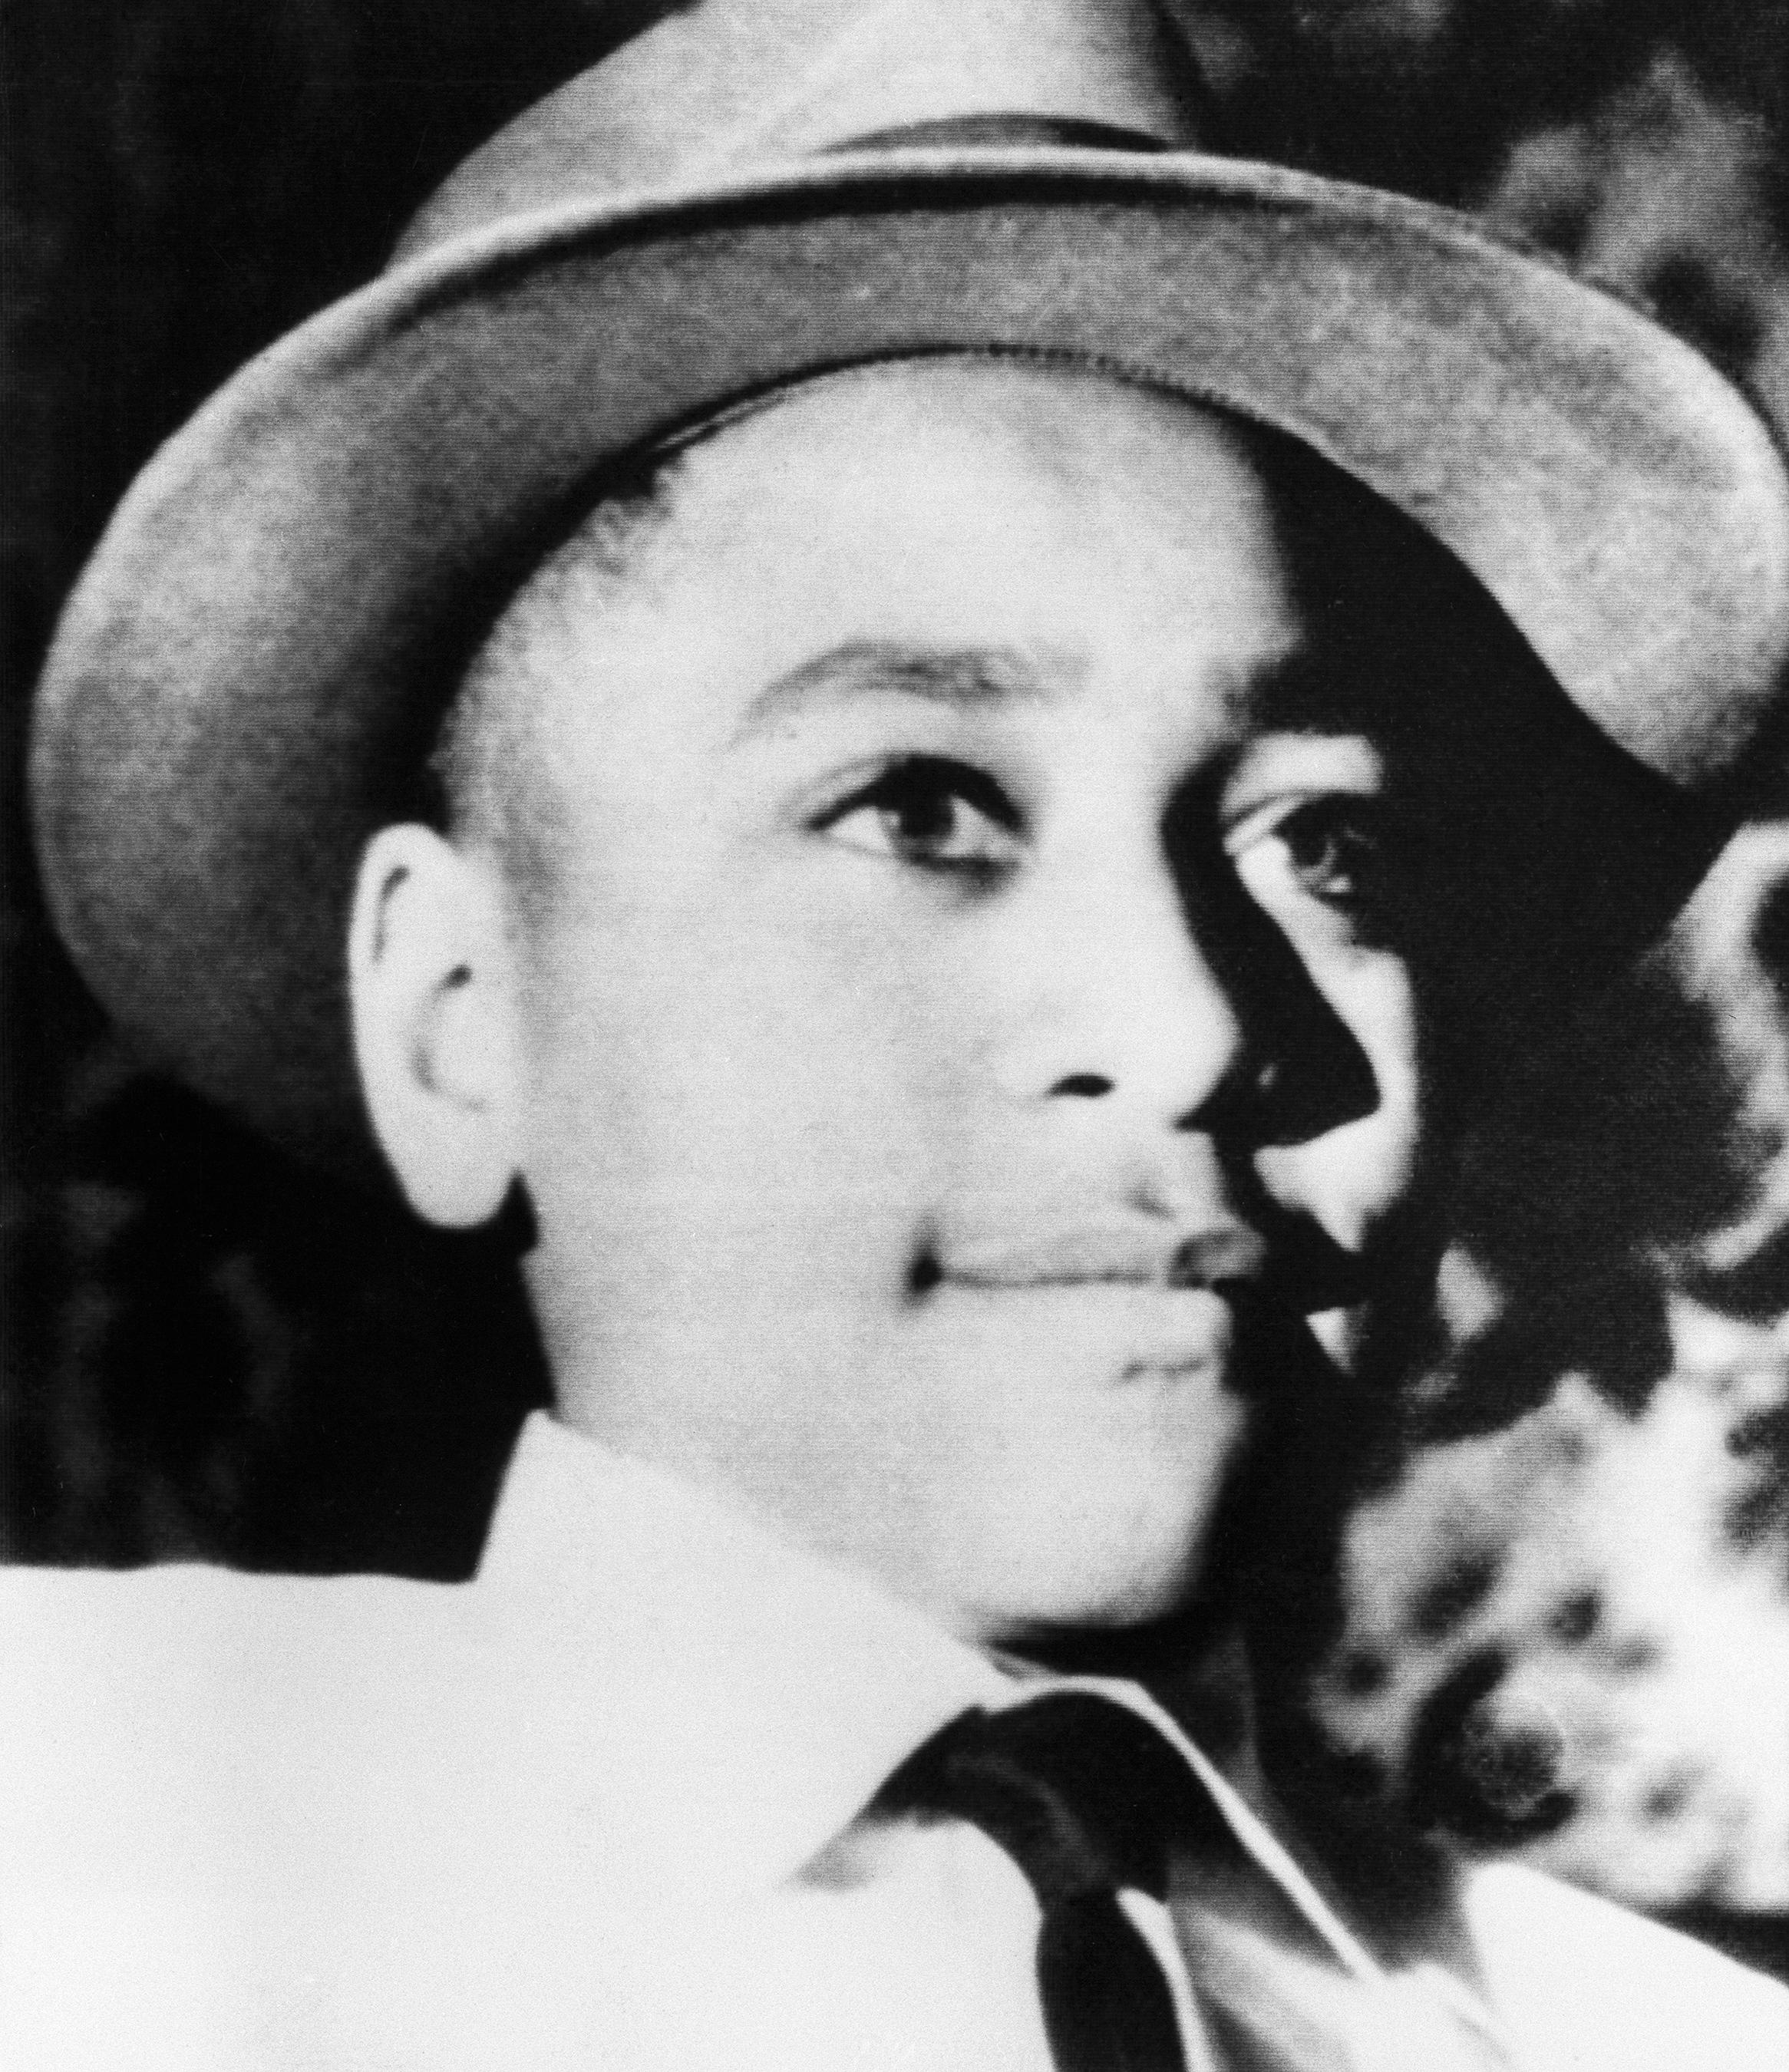 House of Representatives Passes Anti-Lynching Bill Named After Slain Black Teen Emmett Till